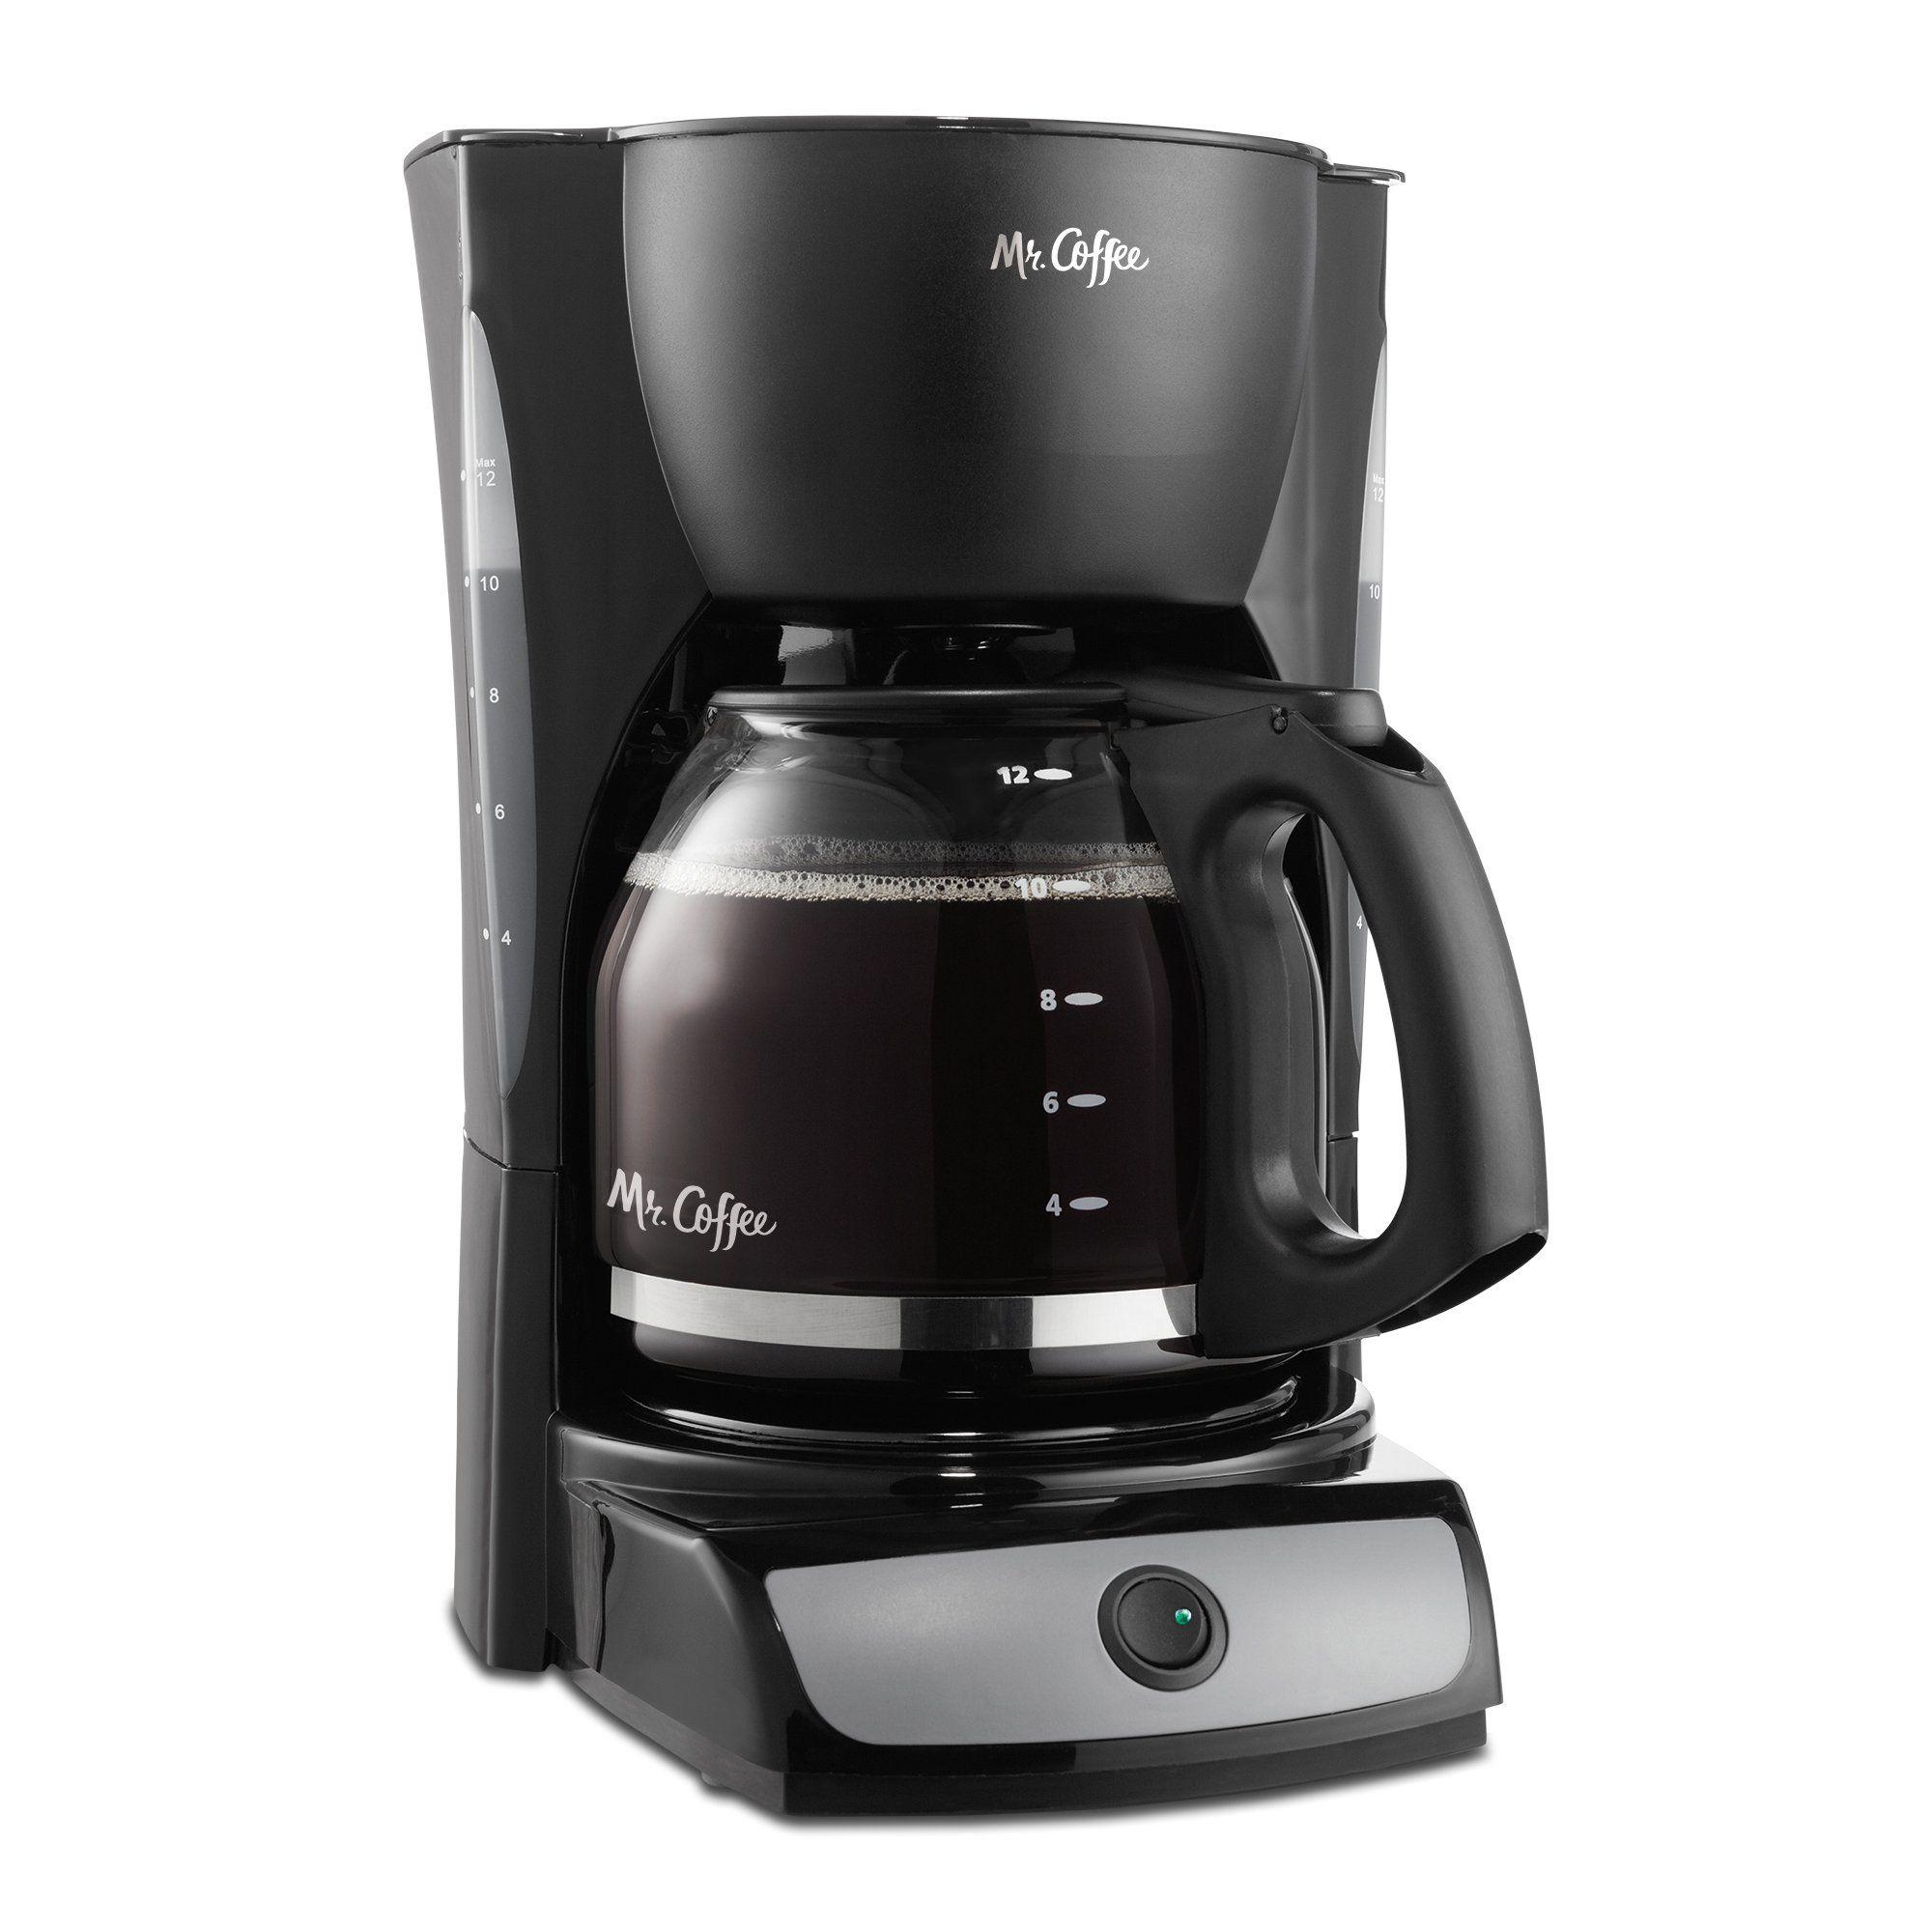 Mr. Coffee CG13 12Cup Switch Coffeemaker, Black Mr